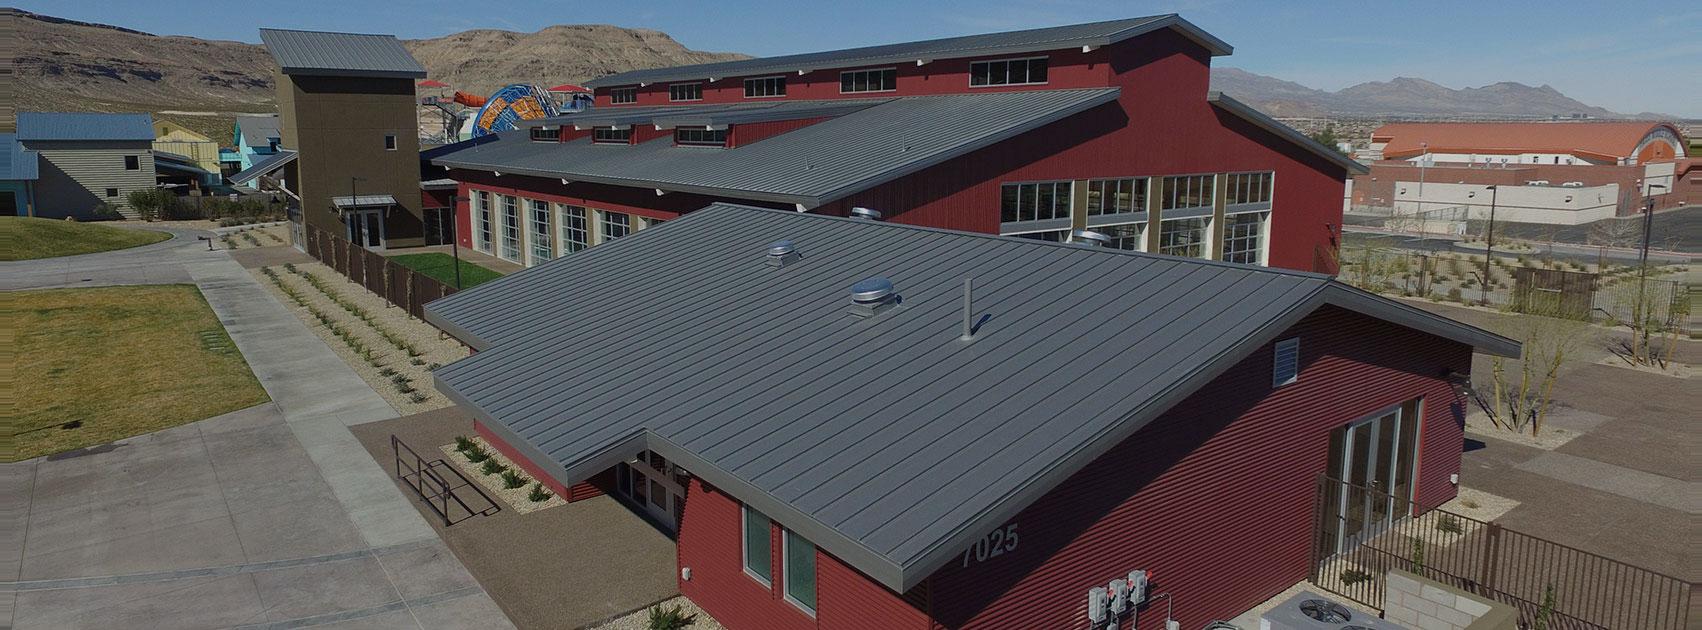 summerlin acquatic center roof metal work